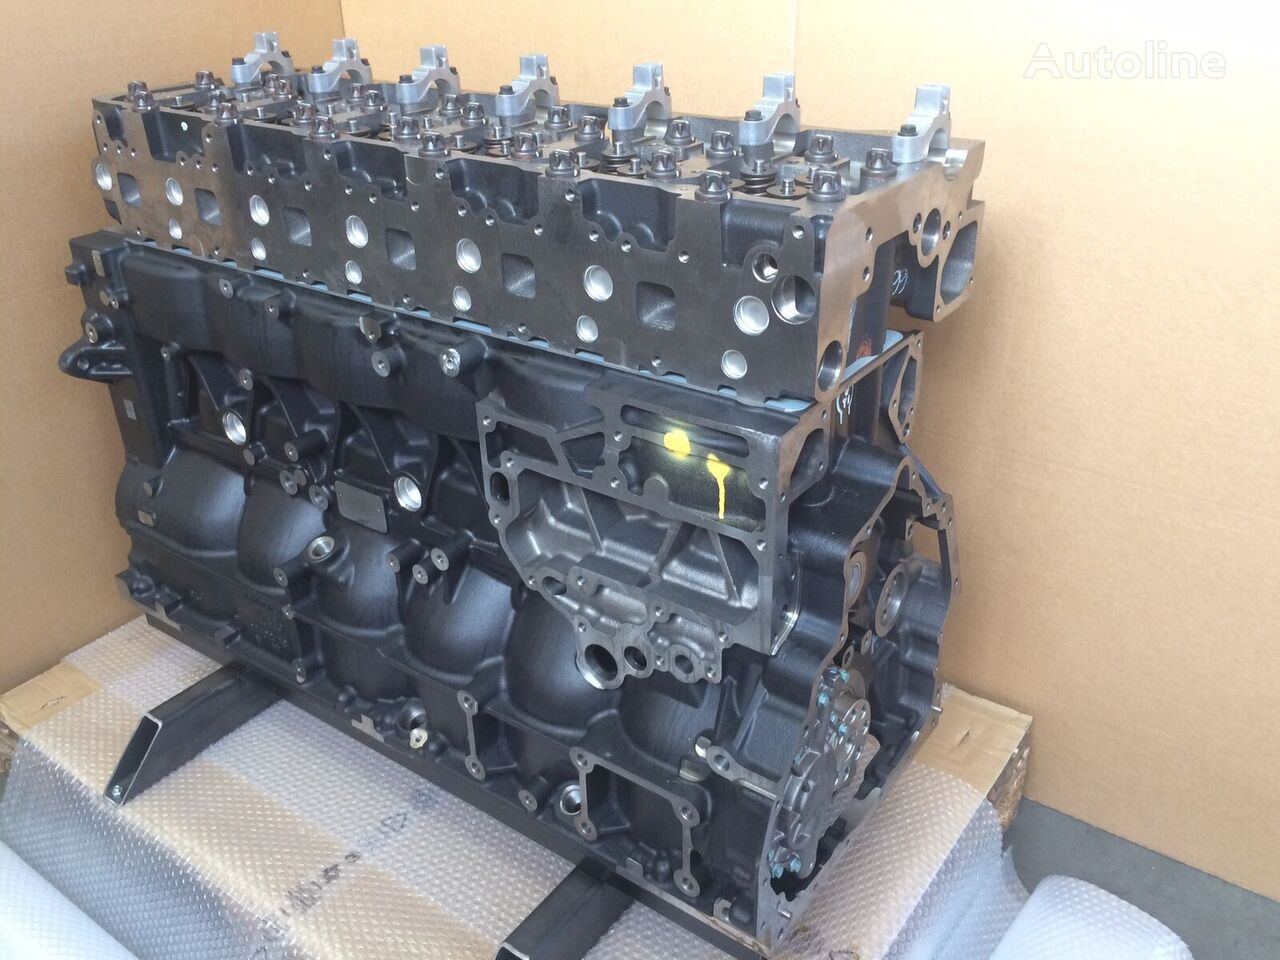 MAN D2676 LOH32 - AUTOBUS VERTICA motor para autobús